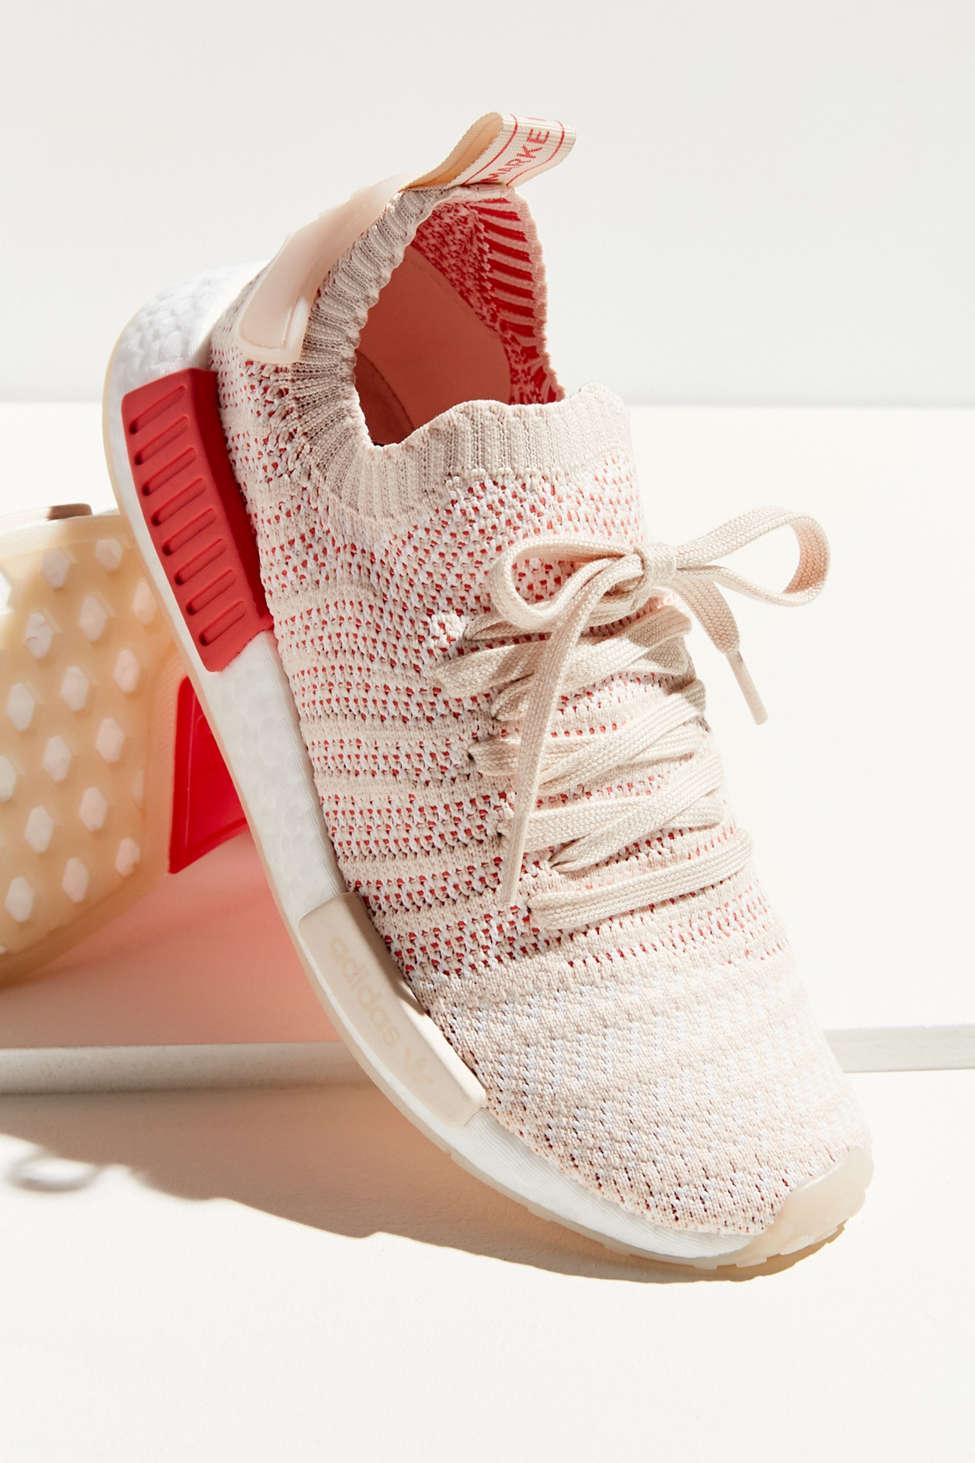 Nmd r1 Stlt Primeknit Sneakers adidas Originals